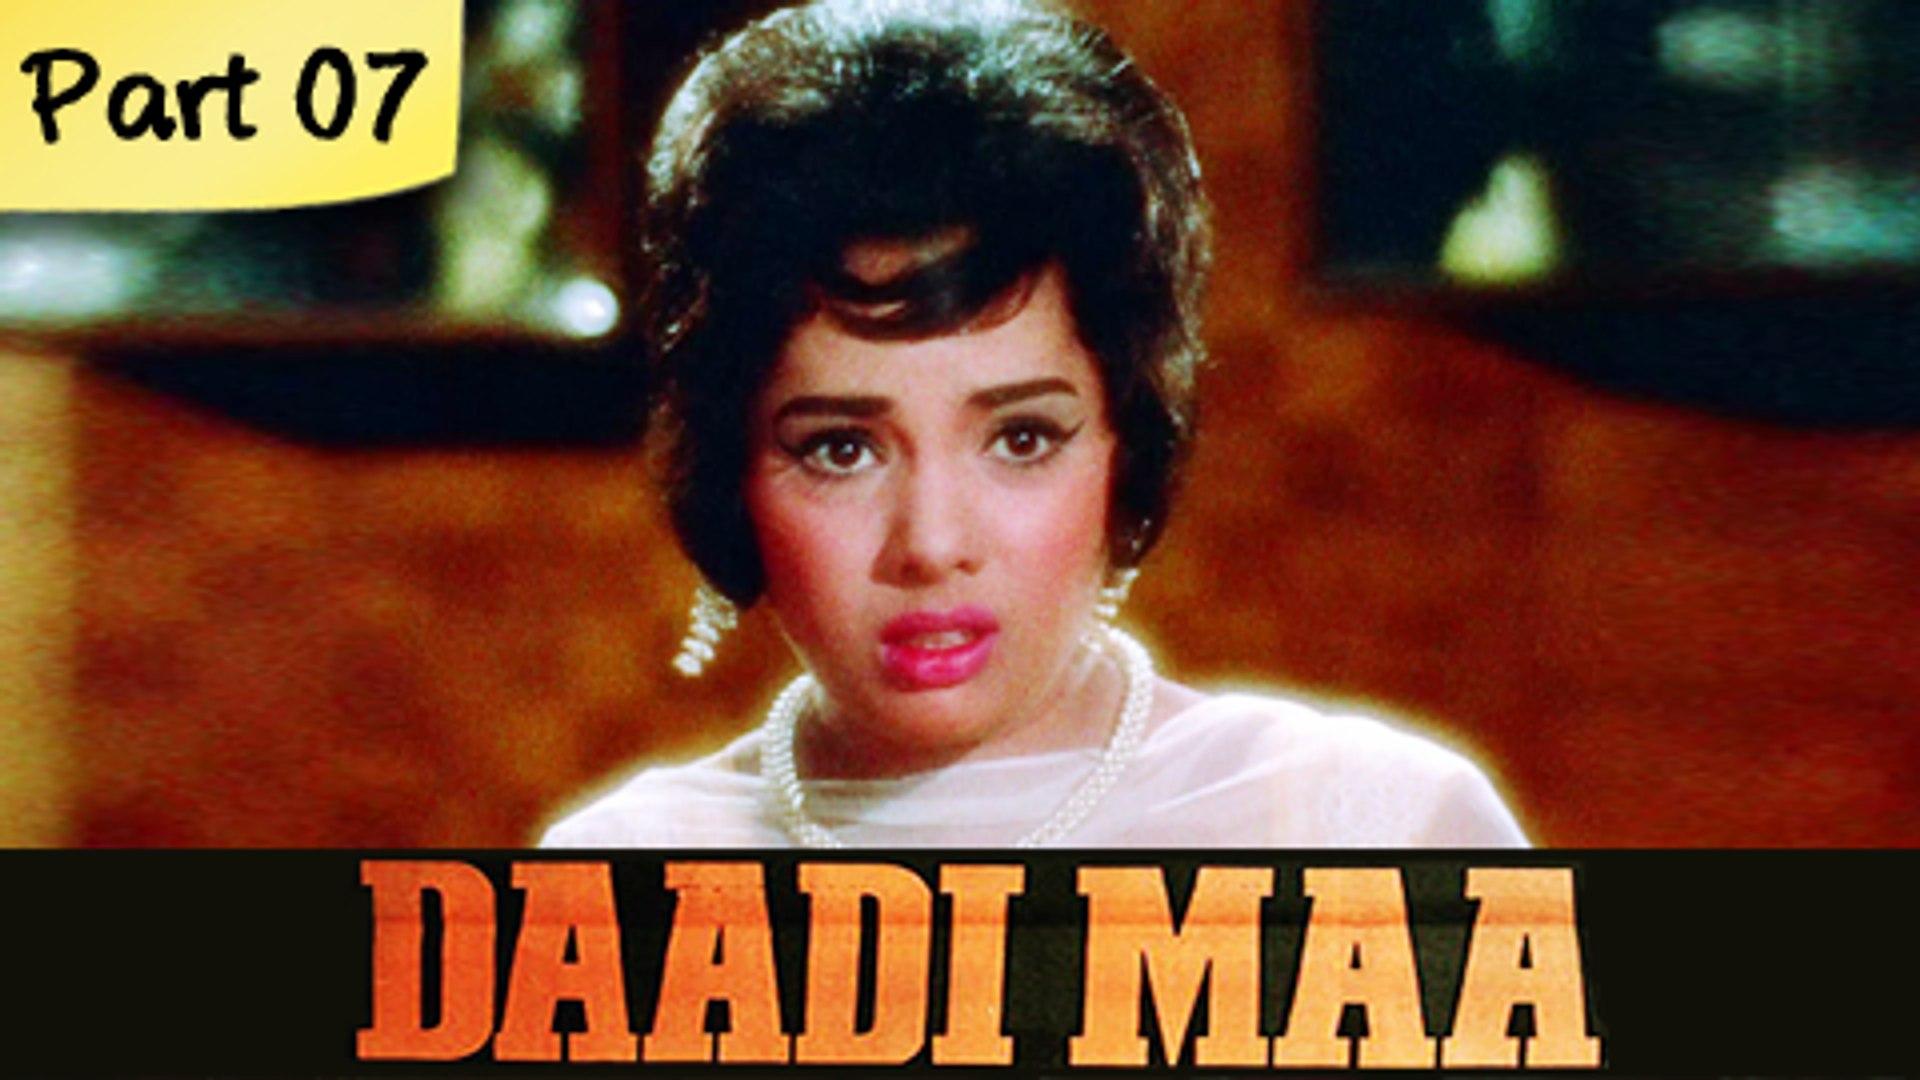 Daadi Maa - Part 07/14 - Super Hit Classic Bollywood Family Movie - Ashok Kumar, Mumtaz, Mehmood